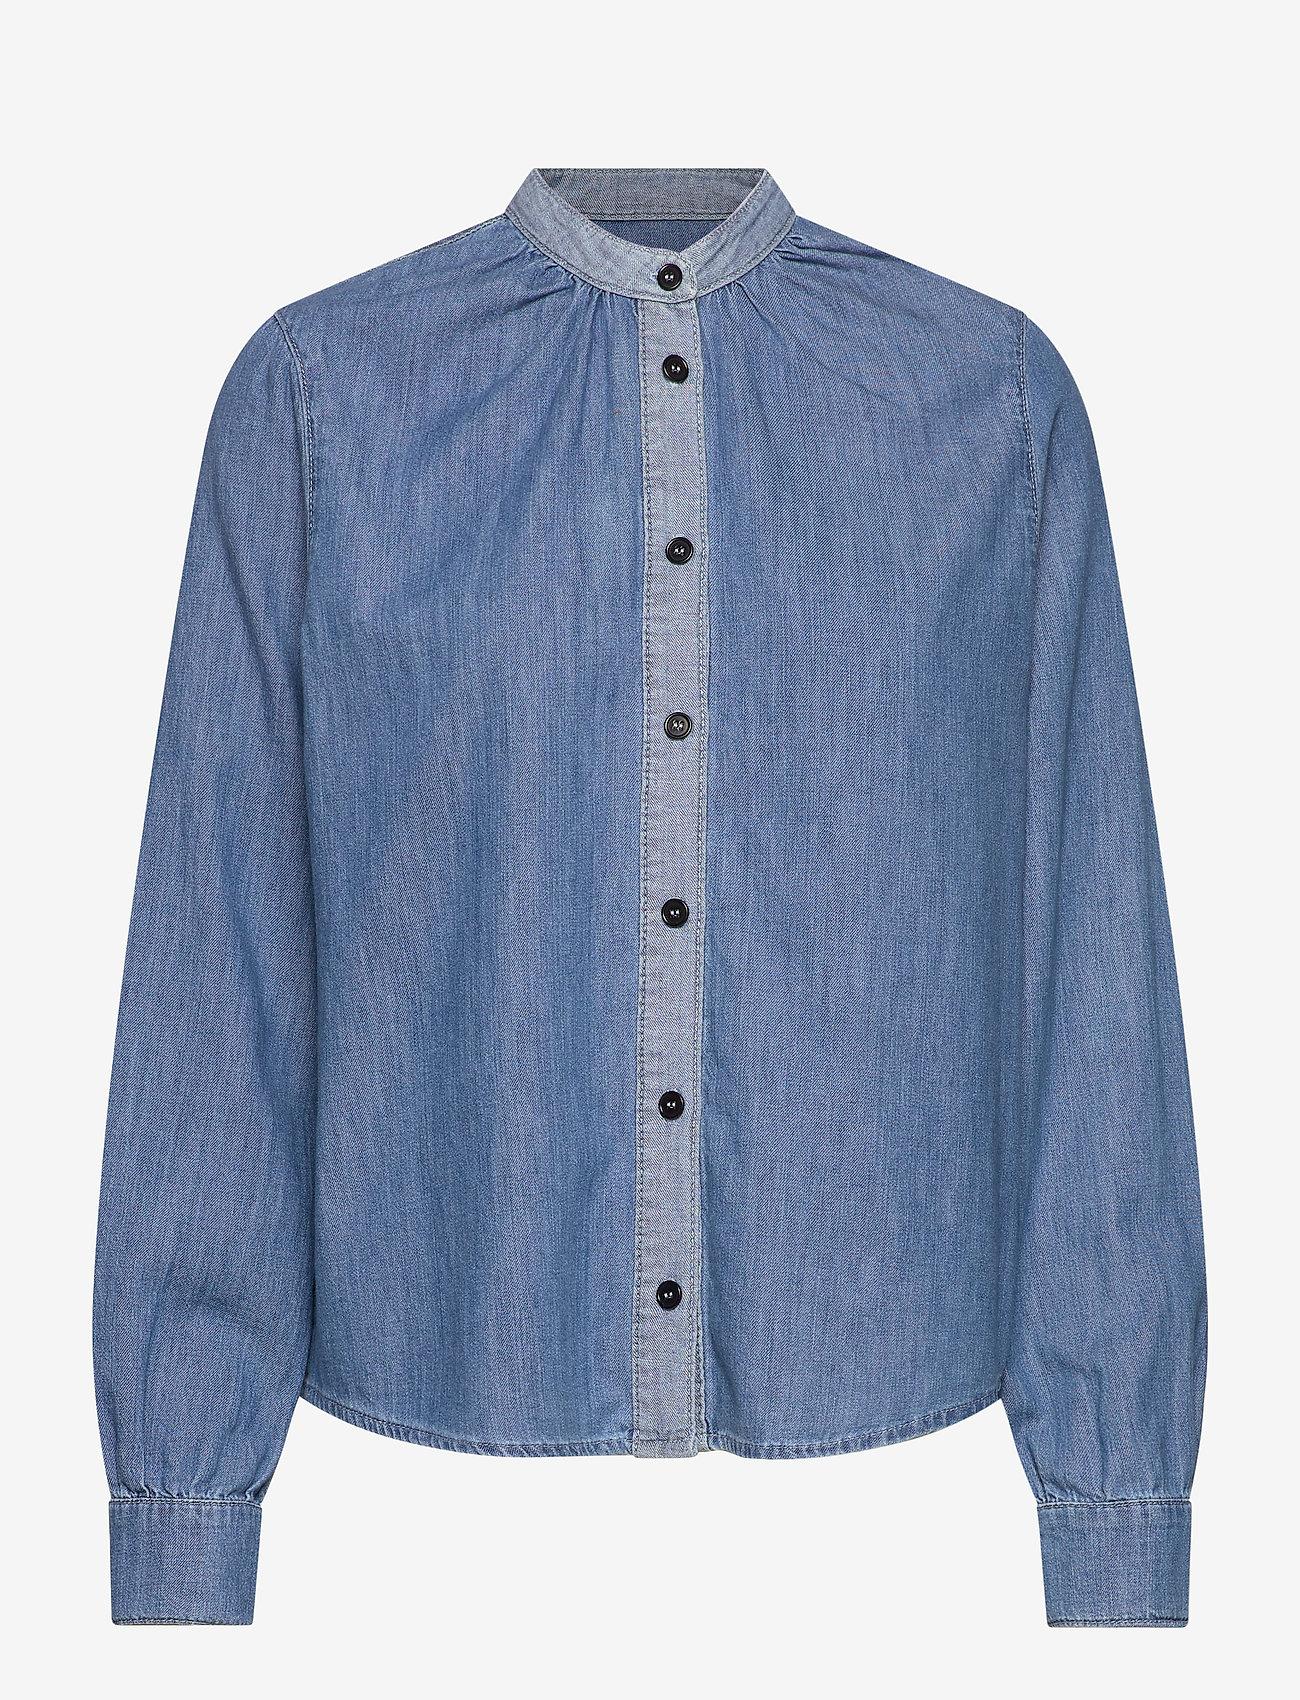 Mads Nørgaard - Light Indigo Sylle - jeansblouses - mid blue - 1